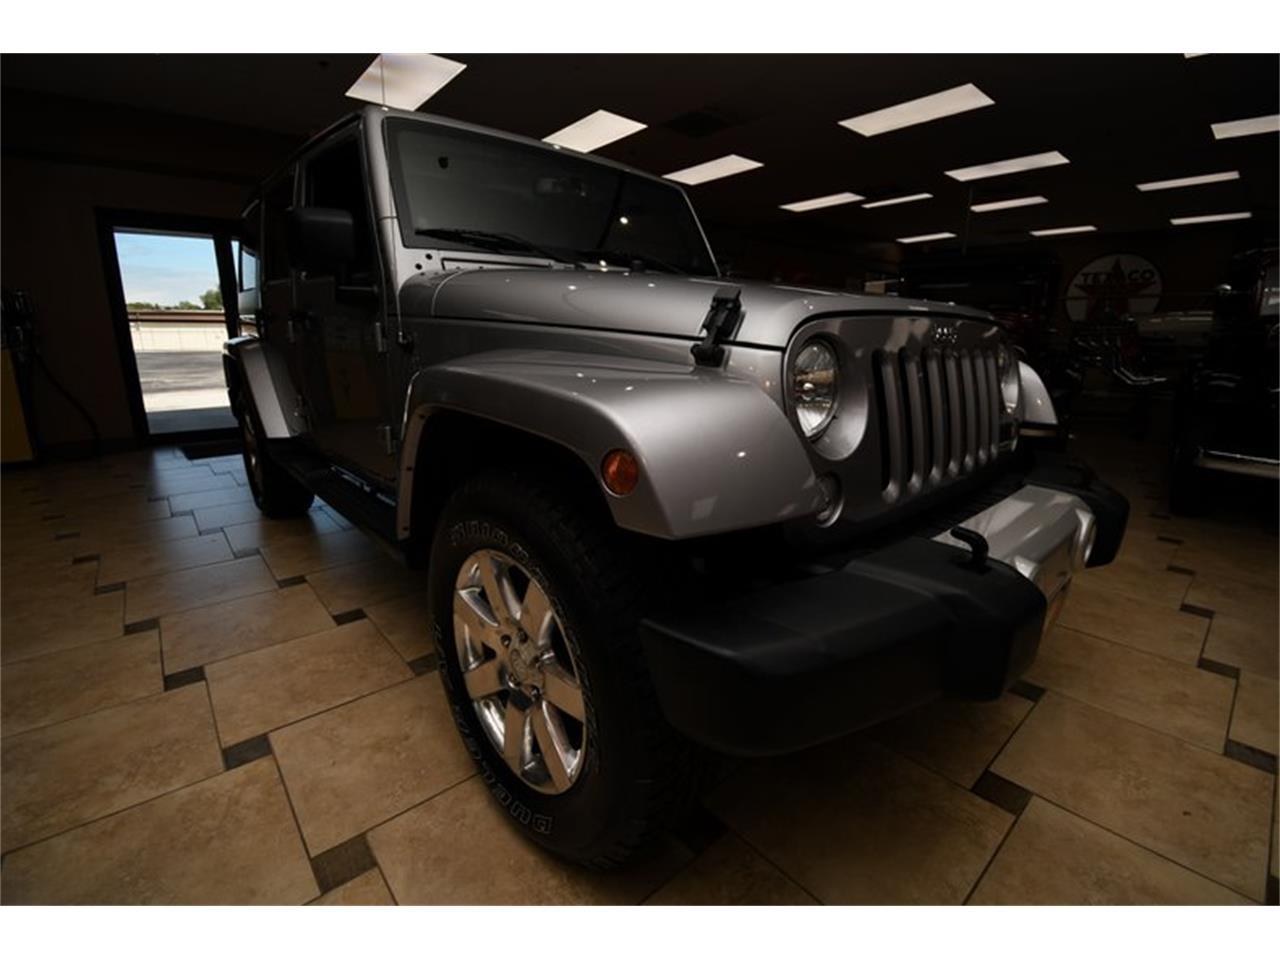 2014 Jeep Wrangler (CC-1344905) for sale in Venice, Florida